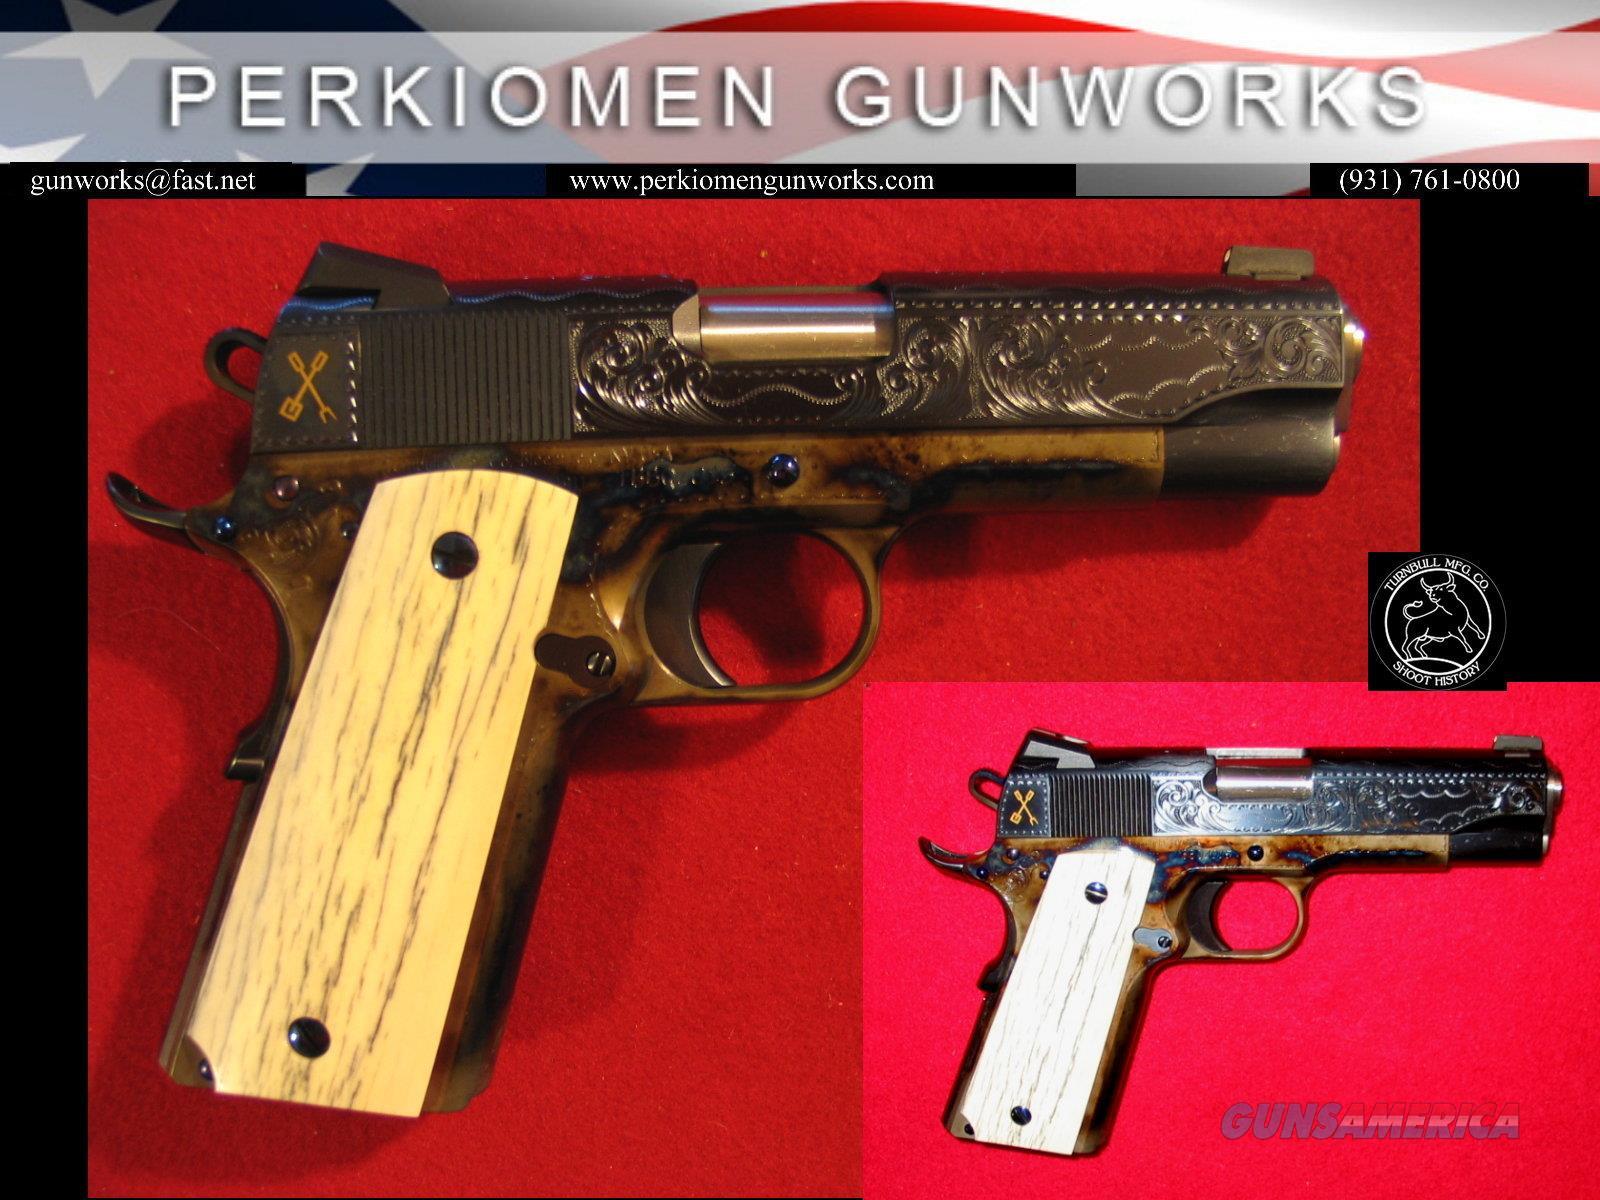 TURNBULL BBQ COMMANDER HERITAGE MODEL 1911, 45acp, New  Guns > Pistols > Custom Pistols > 1911 Family